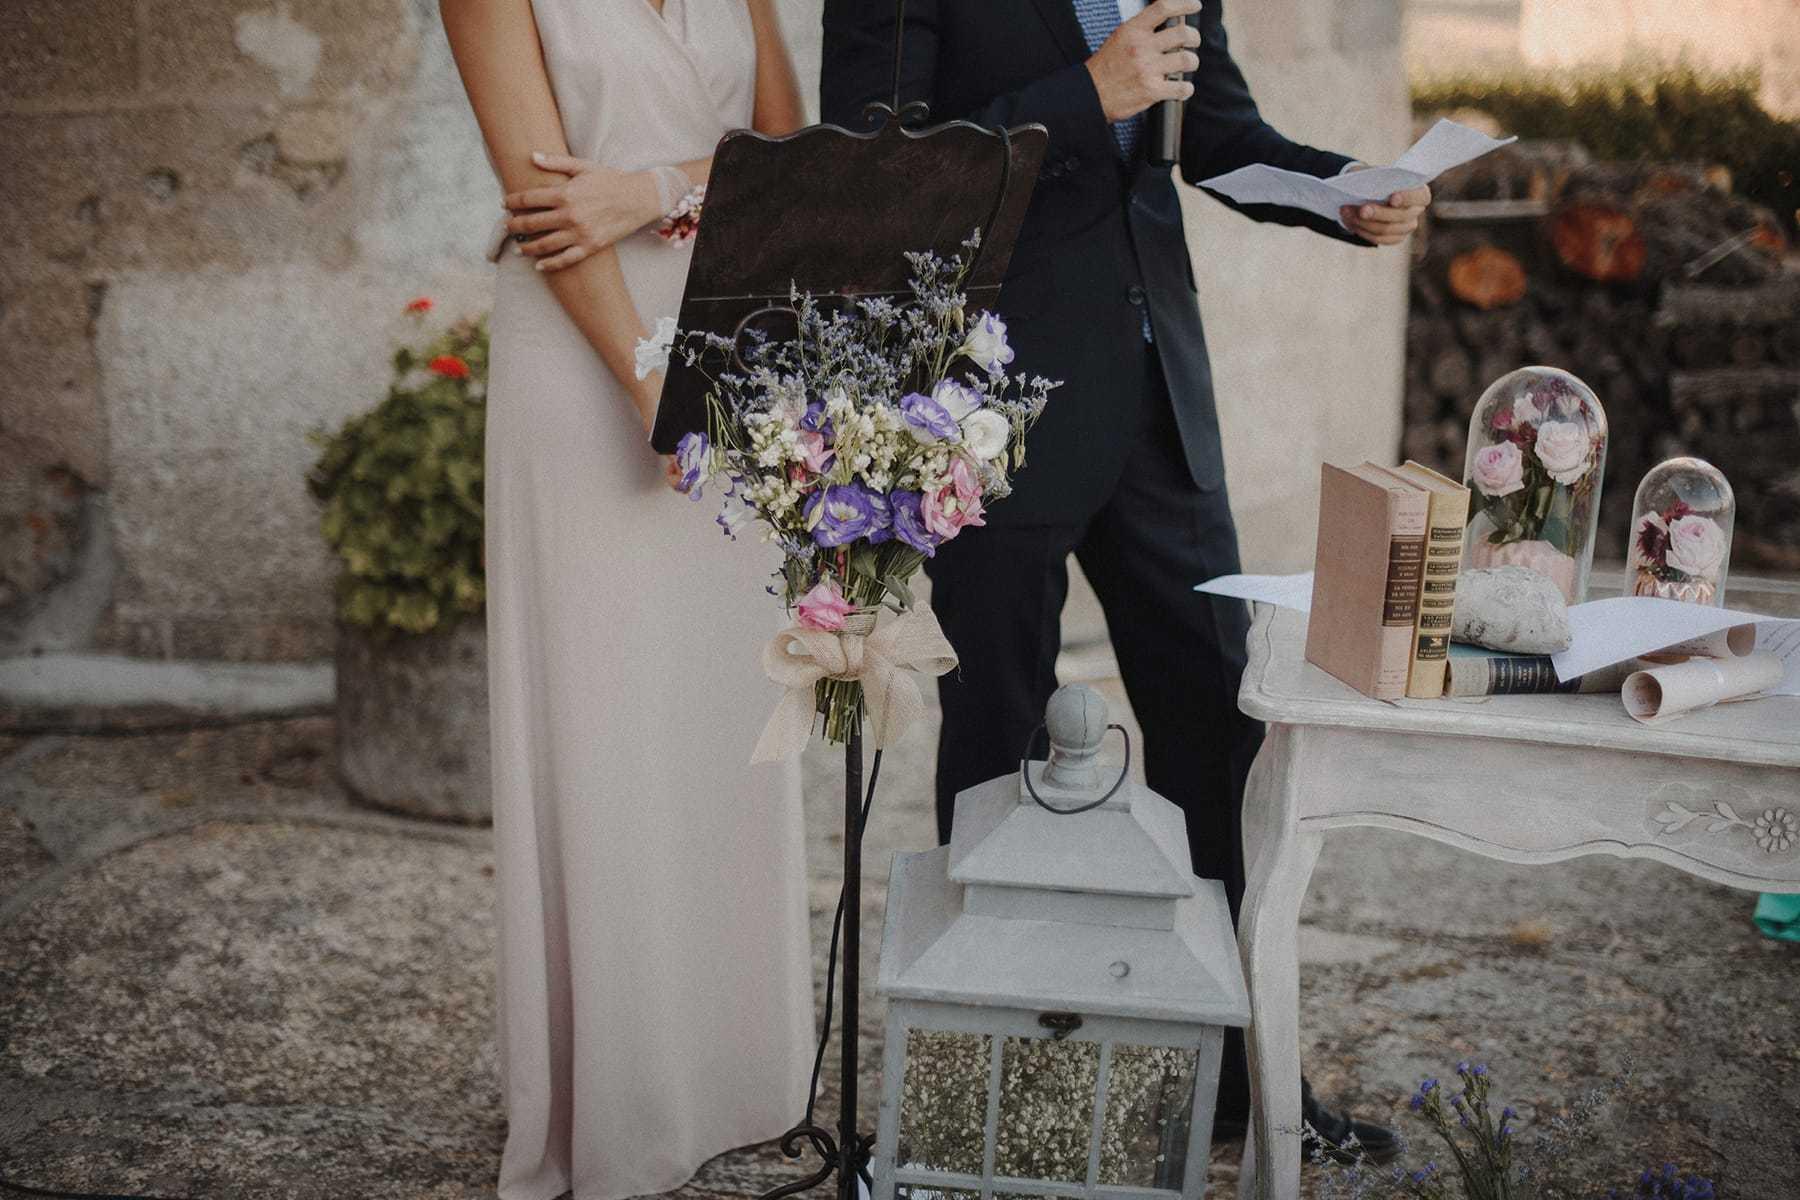 Detalle floral en atril de boda